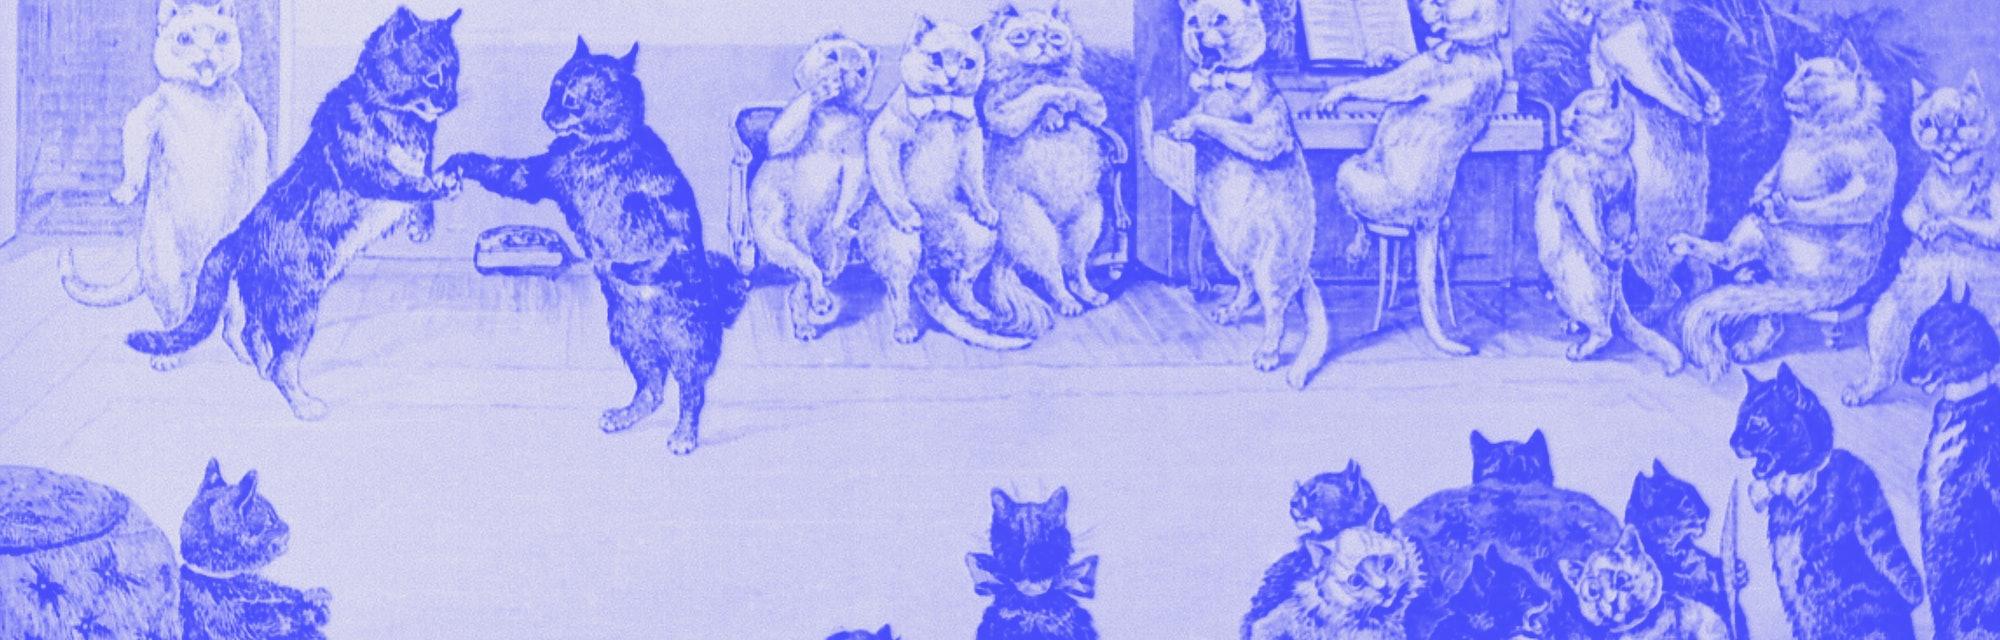 (Original Caption) Cats: A cat's party. Woodcut by Louis Wain, 1891.